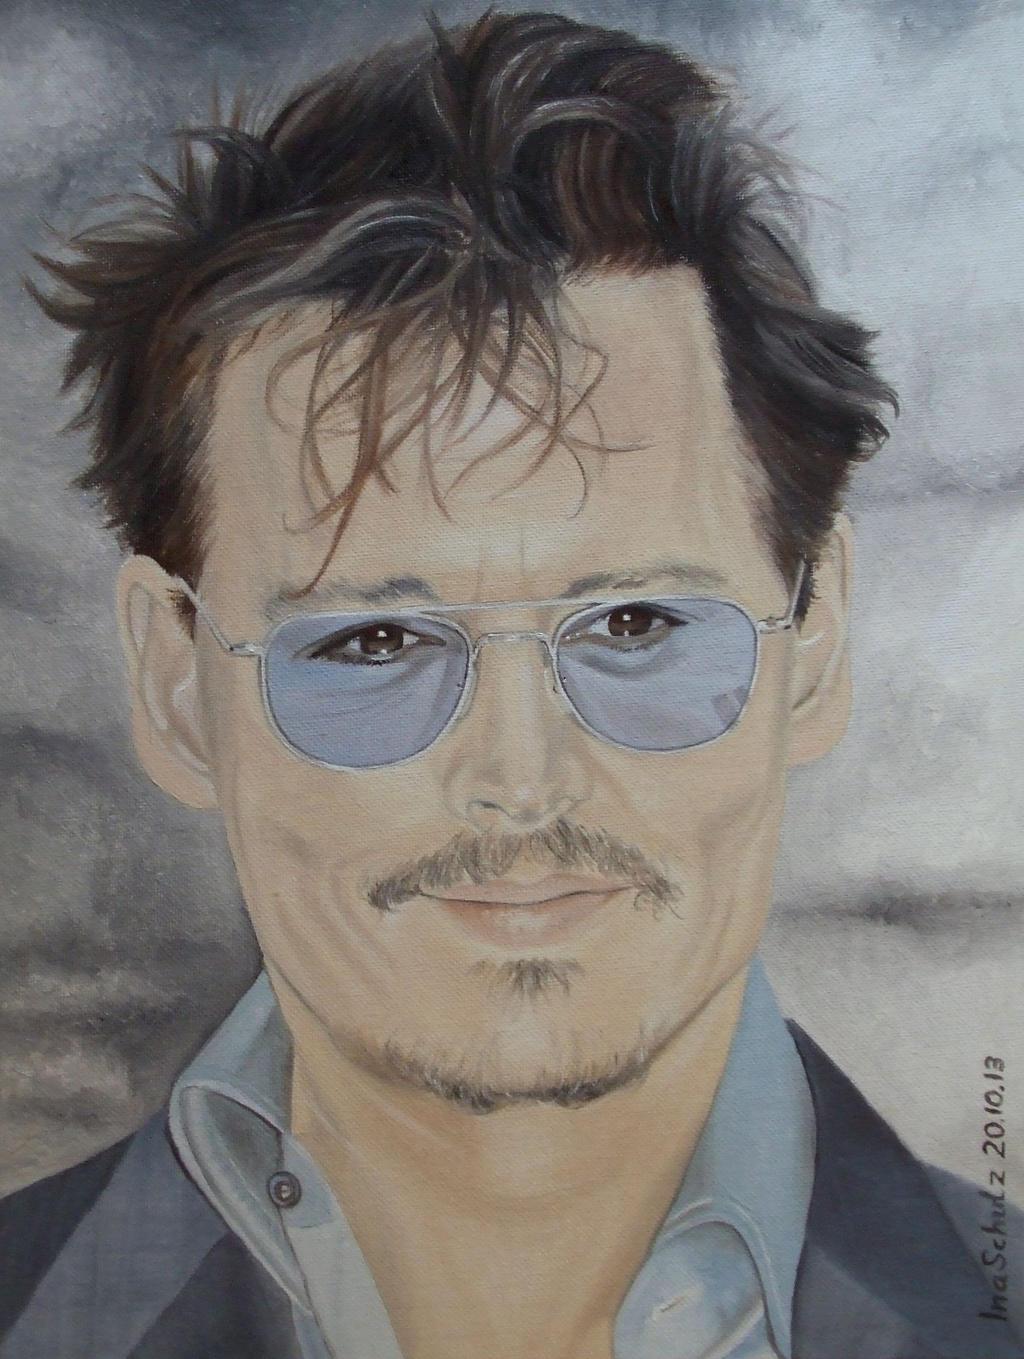 Johnny Depp - London 2013 - 2 by shaman-art